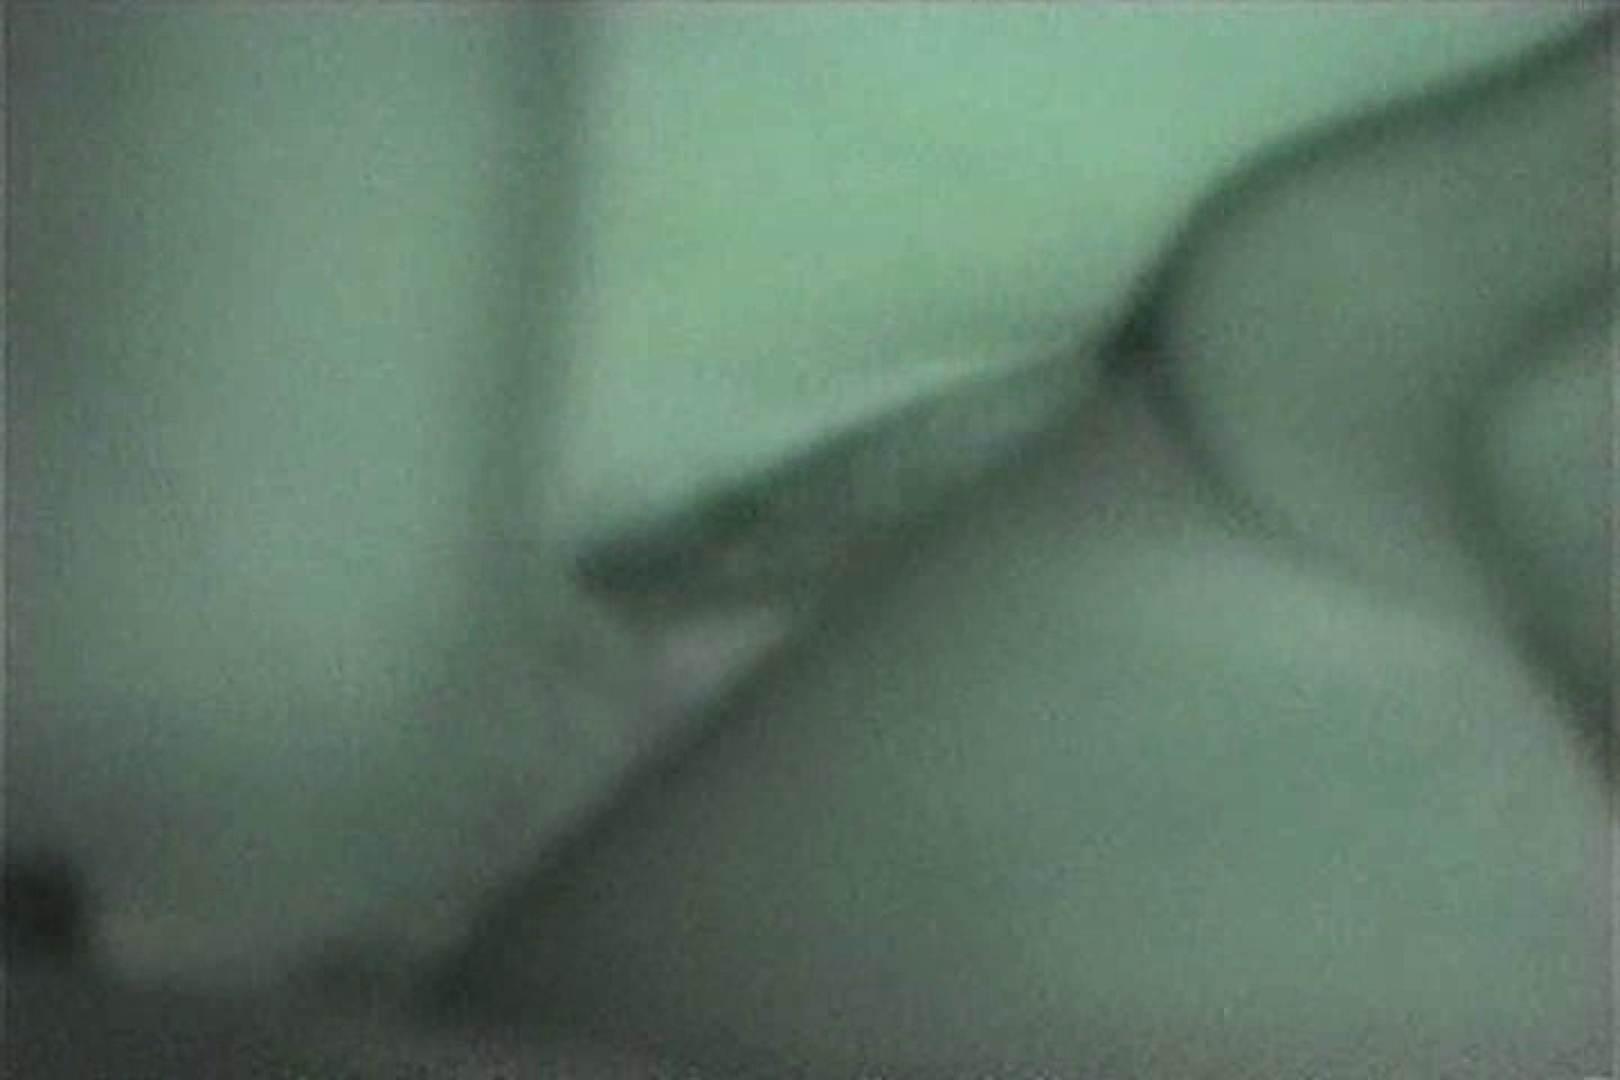 MASAさんの待ち伏せ撮り! 赤外線カーセックスVol.17 カップル ヌード画像 89pic 33